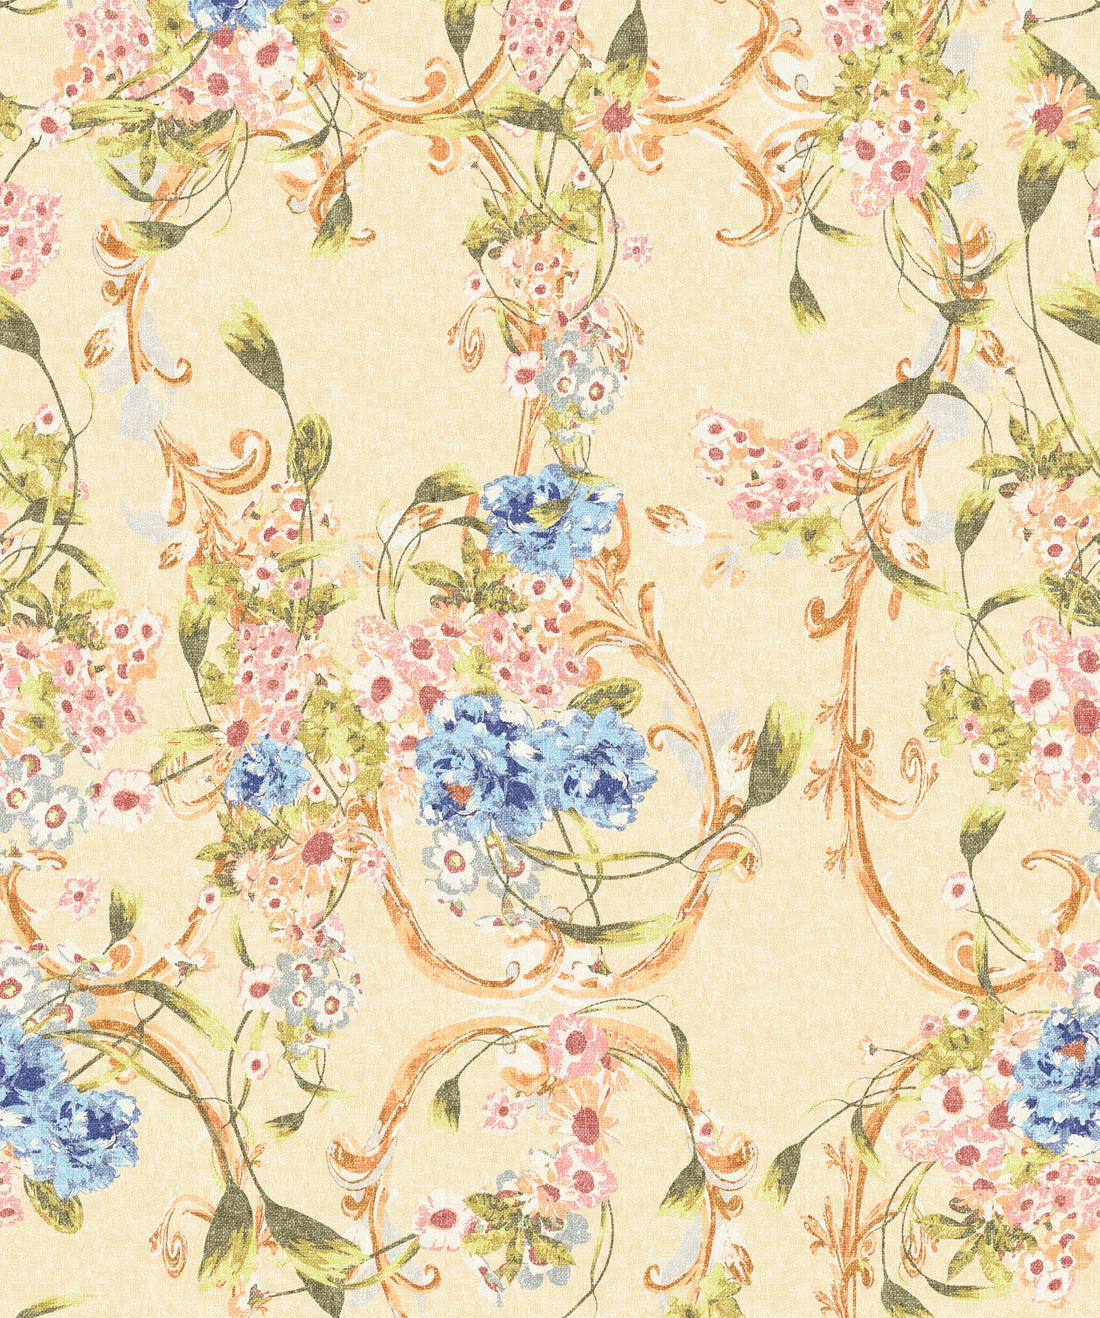 Dainty Vintage Florals Ditsy Floral Wallpaper Milton King